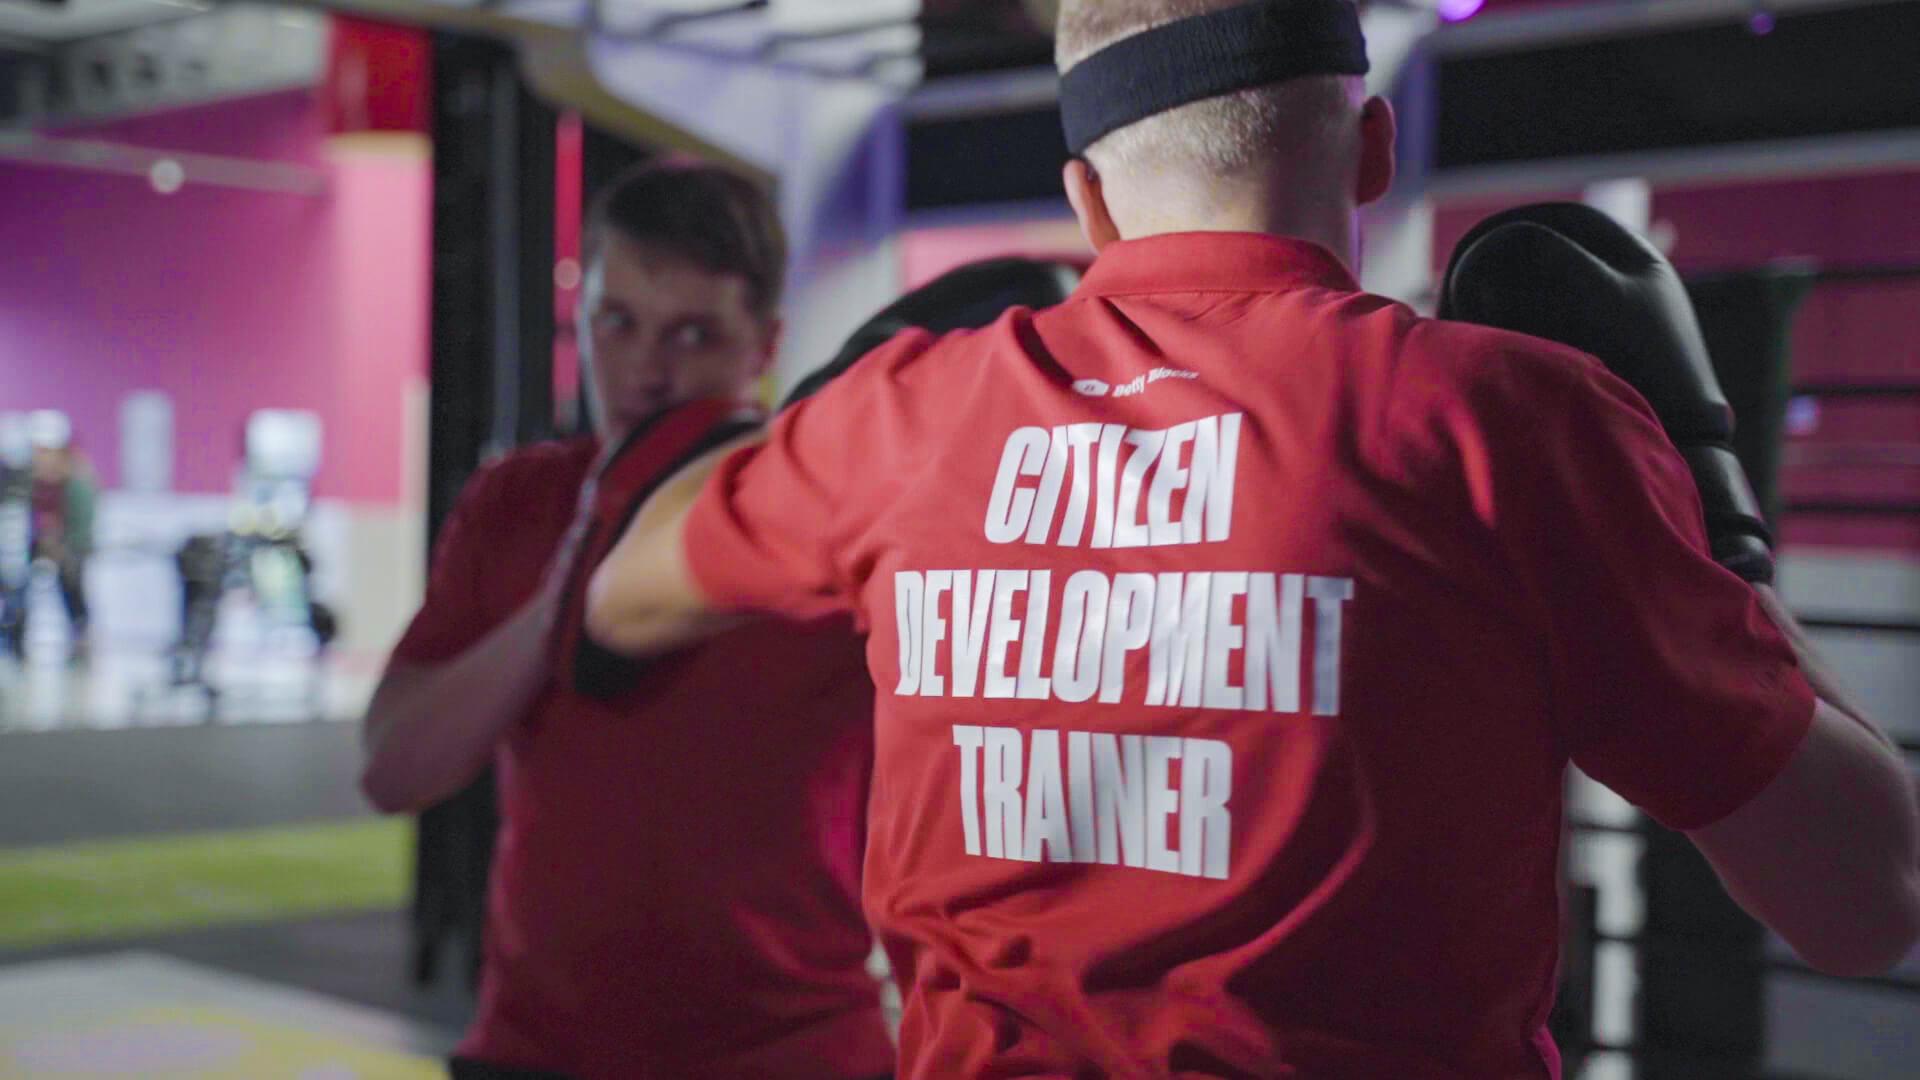 Gartner Barca Promo (1)